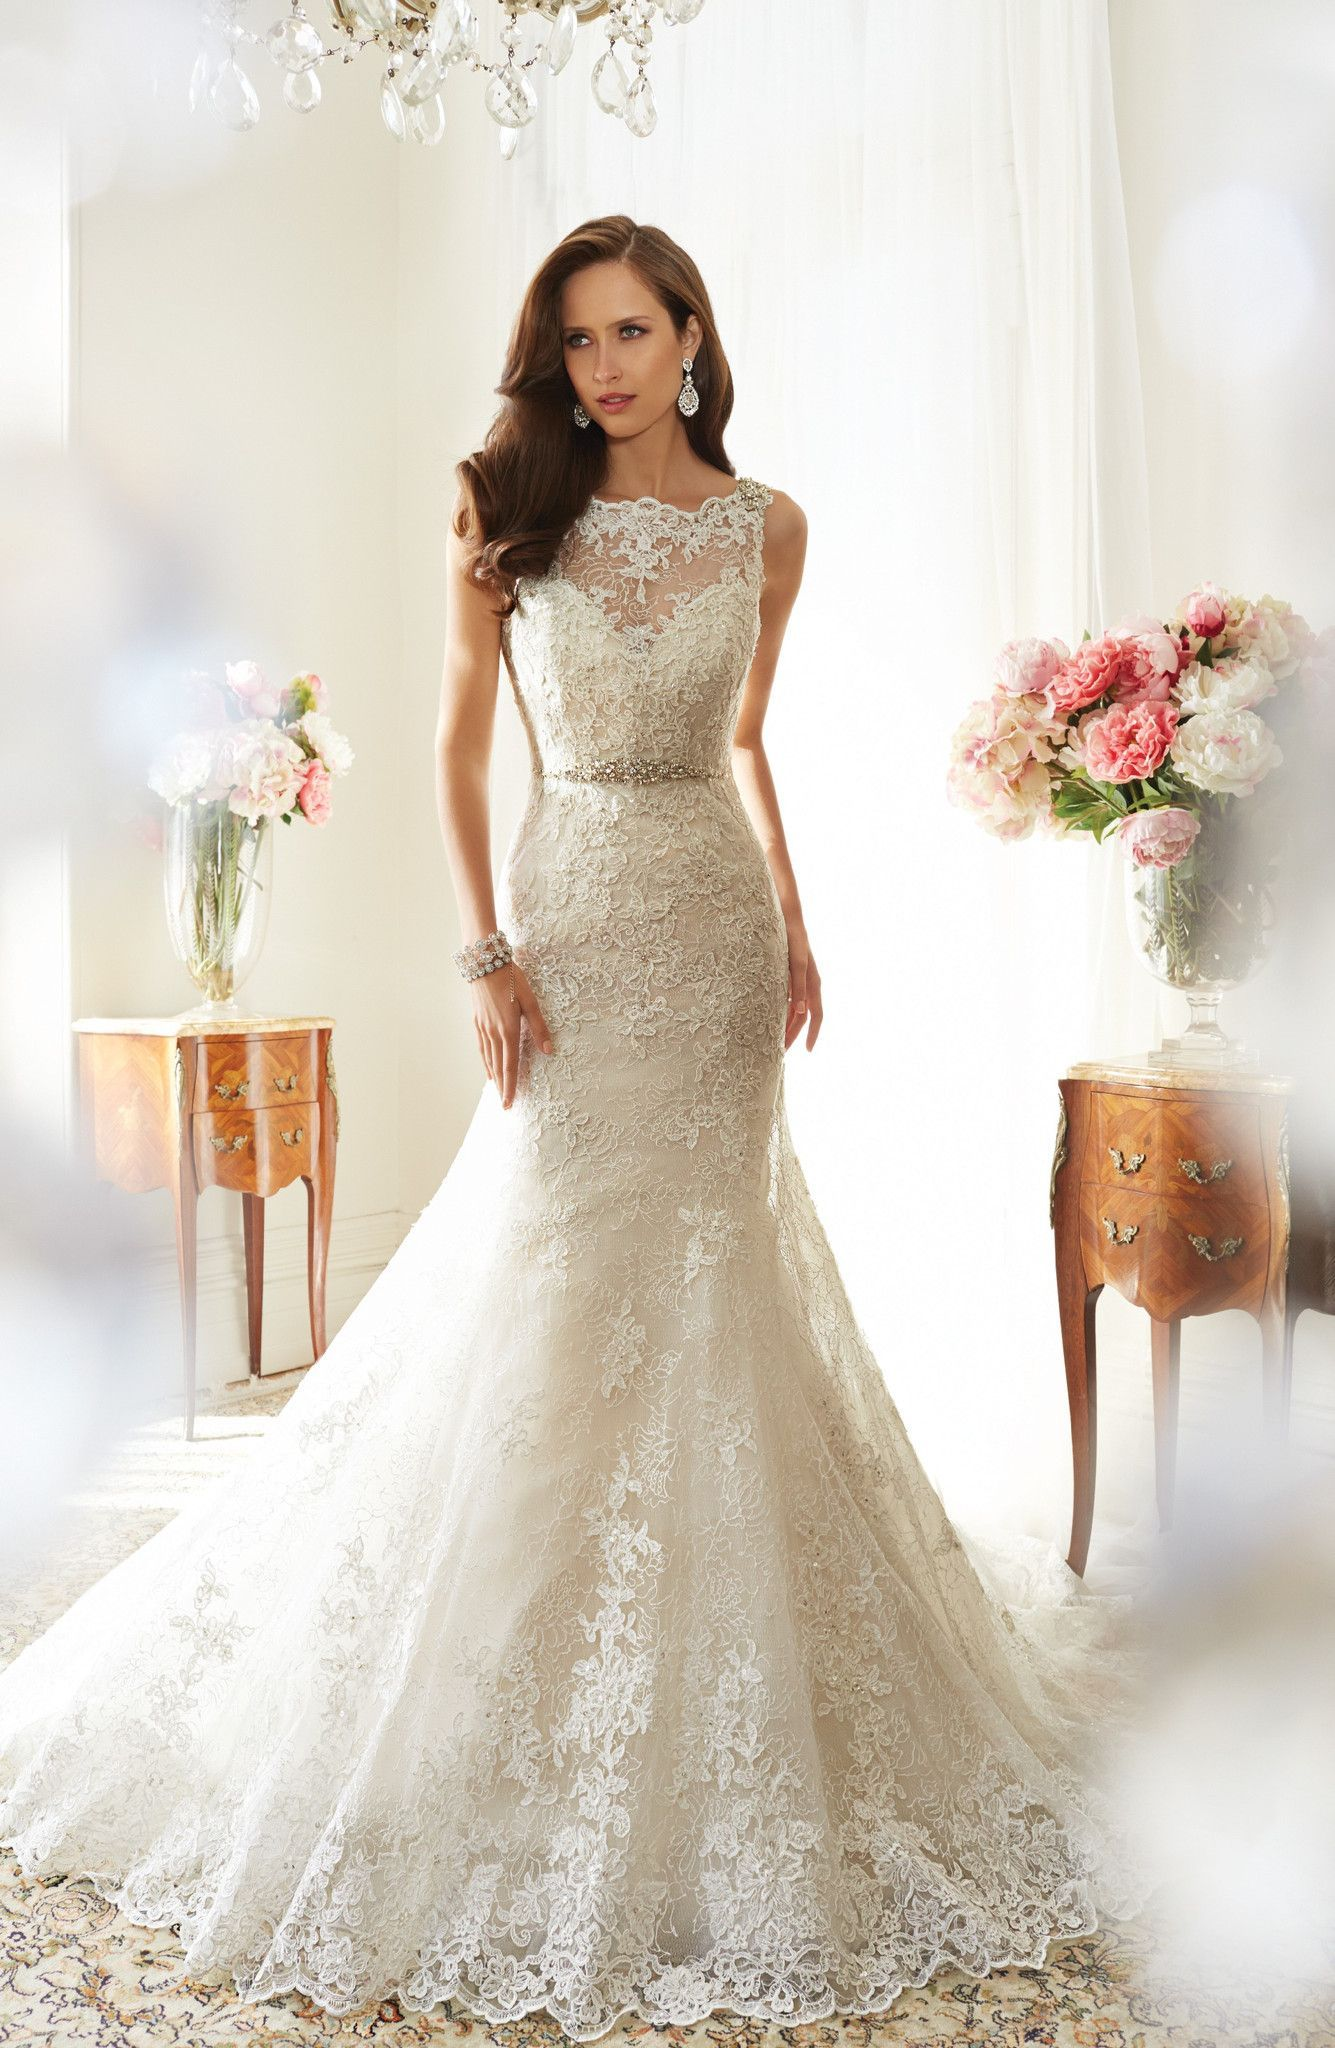 Sophia tolli teal y all dressed up bridal gown bridal